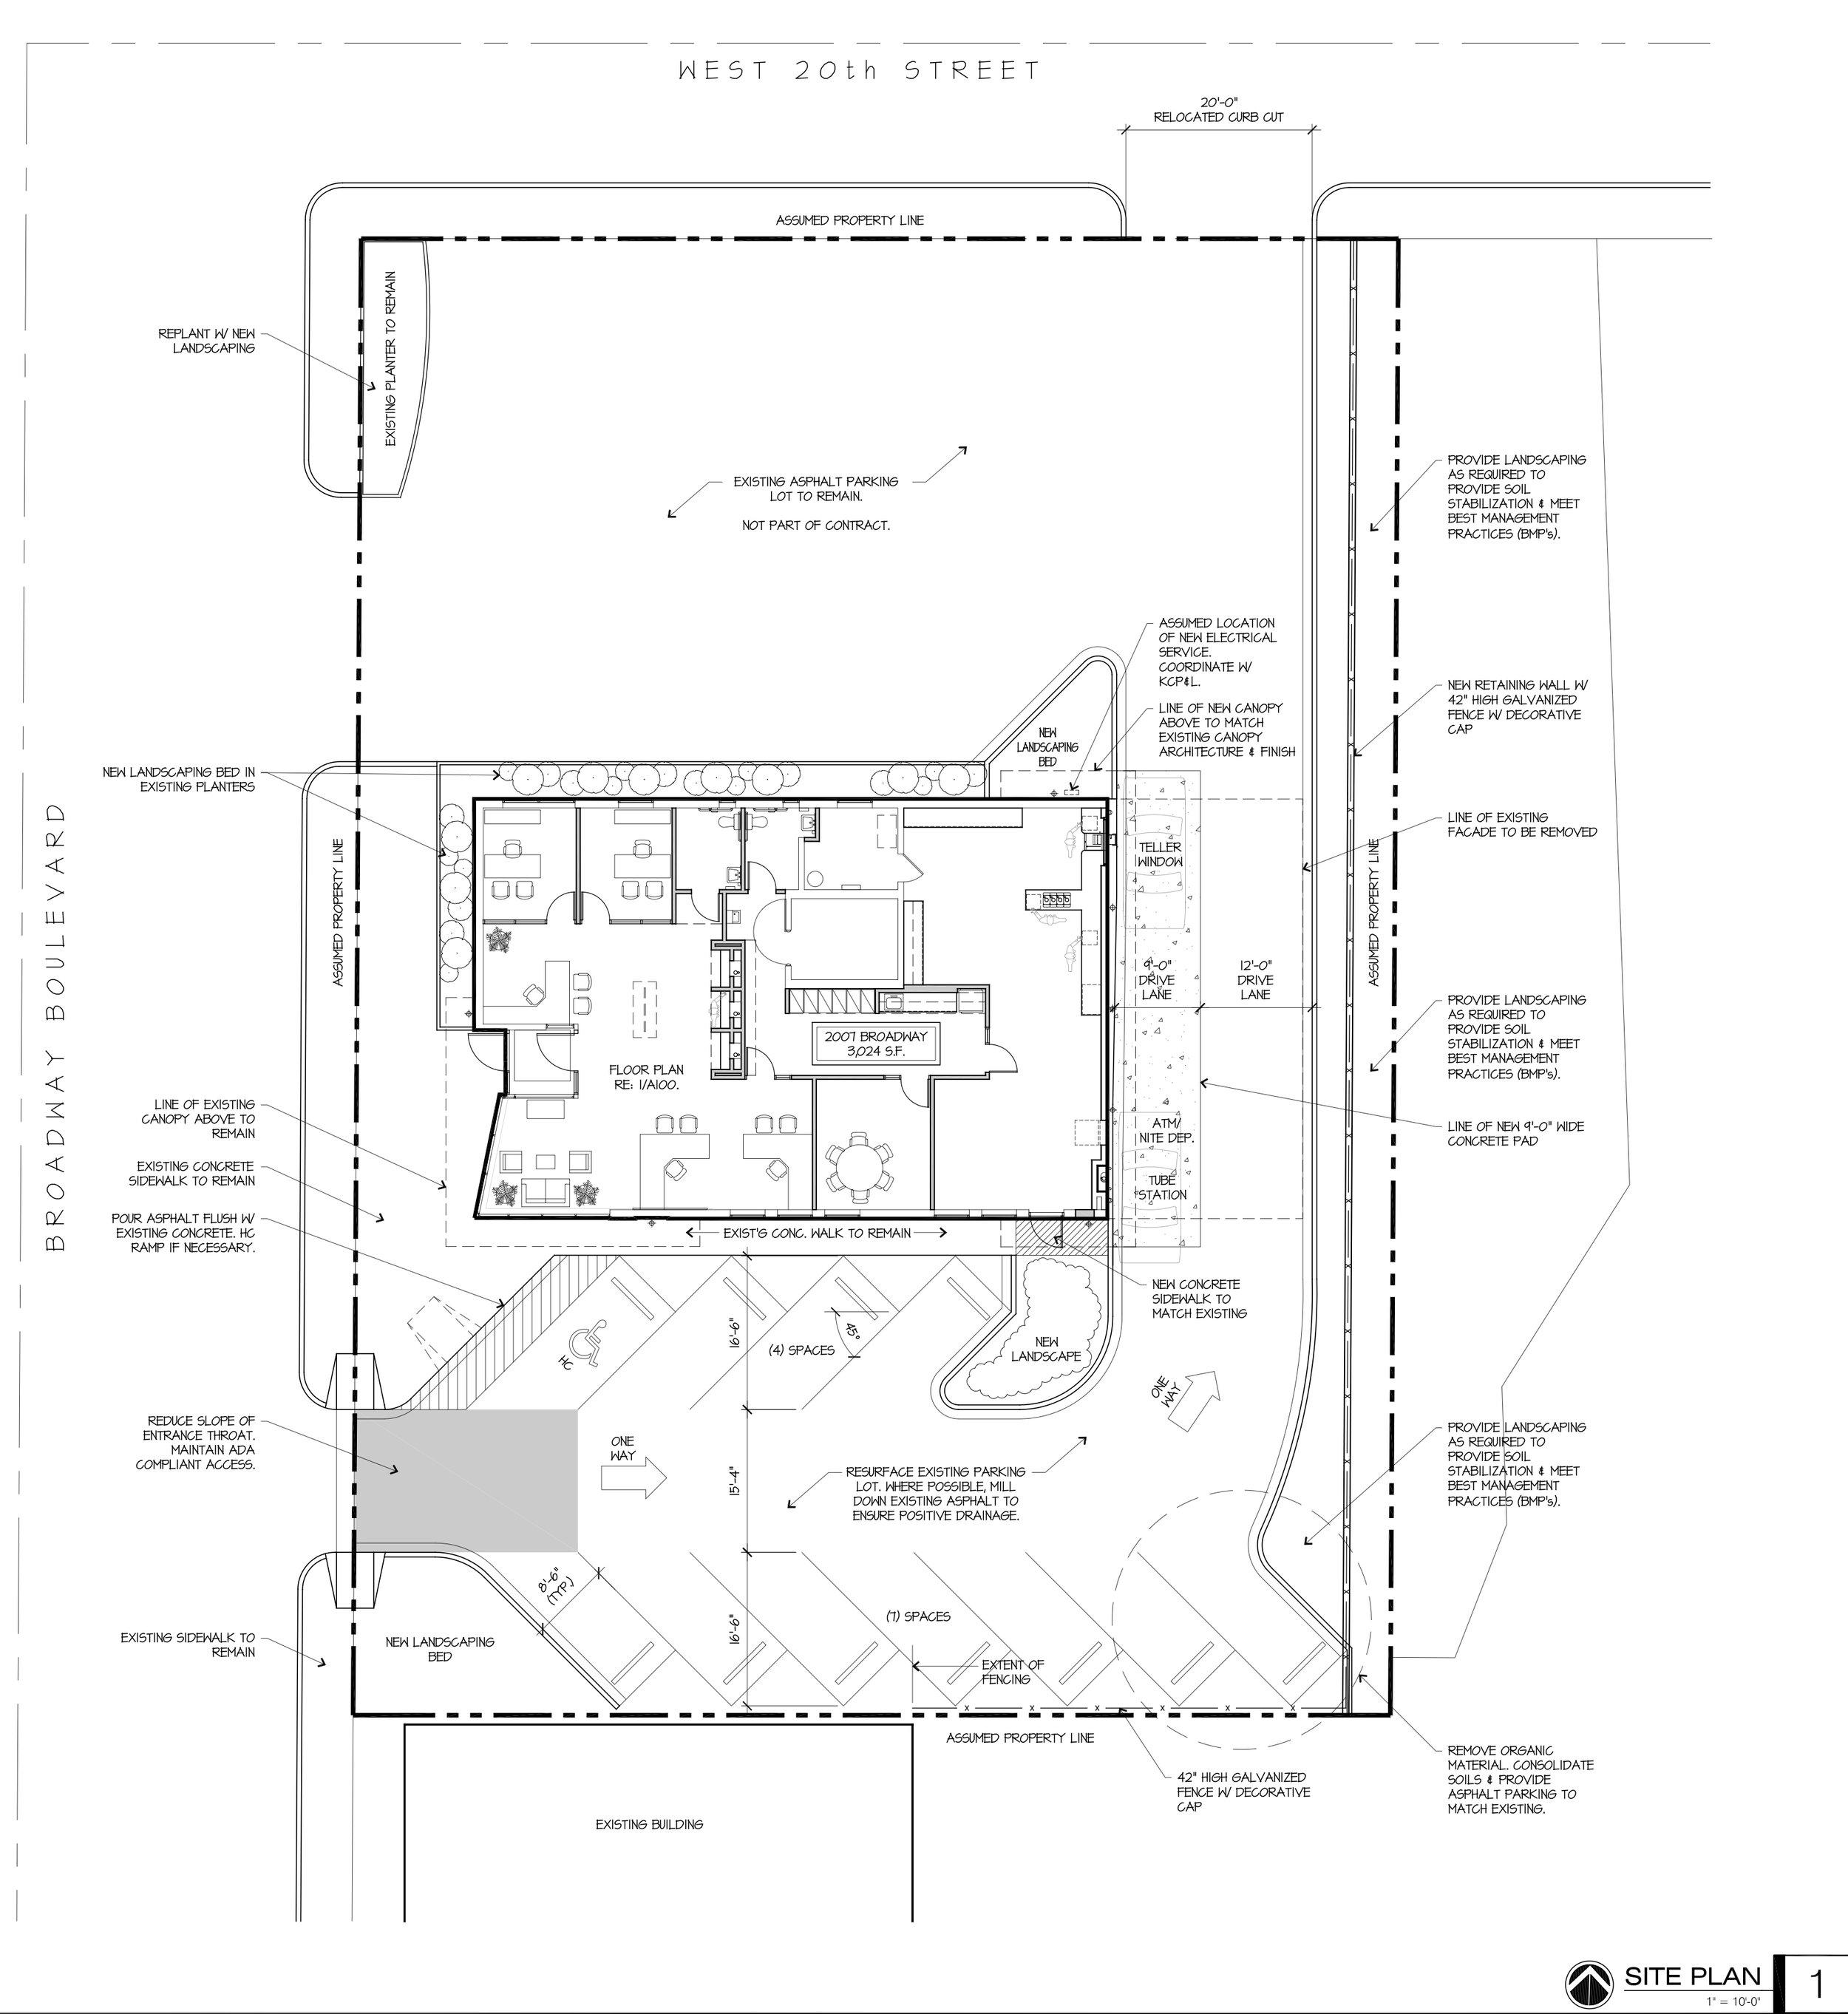 Sier2007 broadway -  Site plan